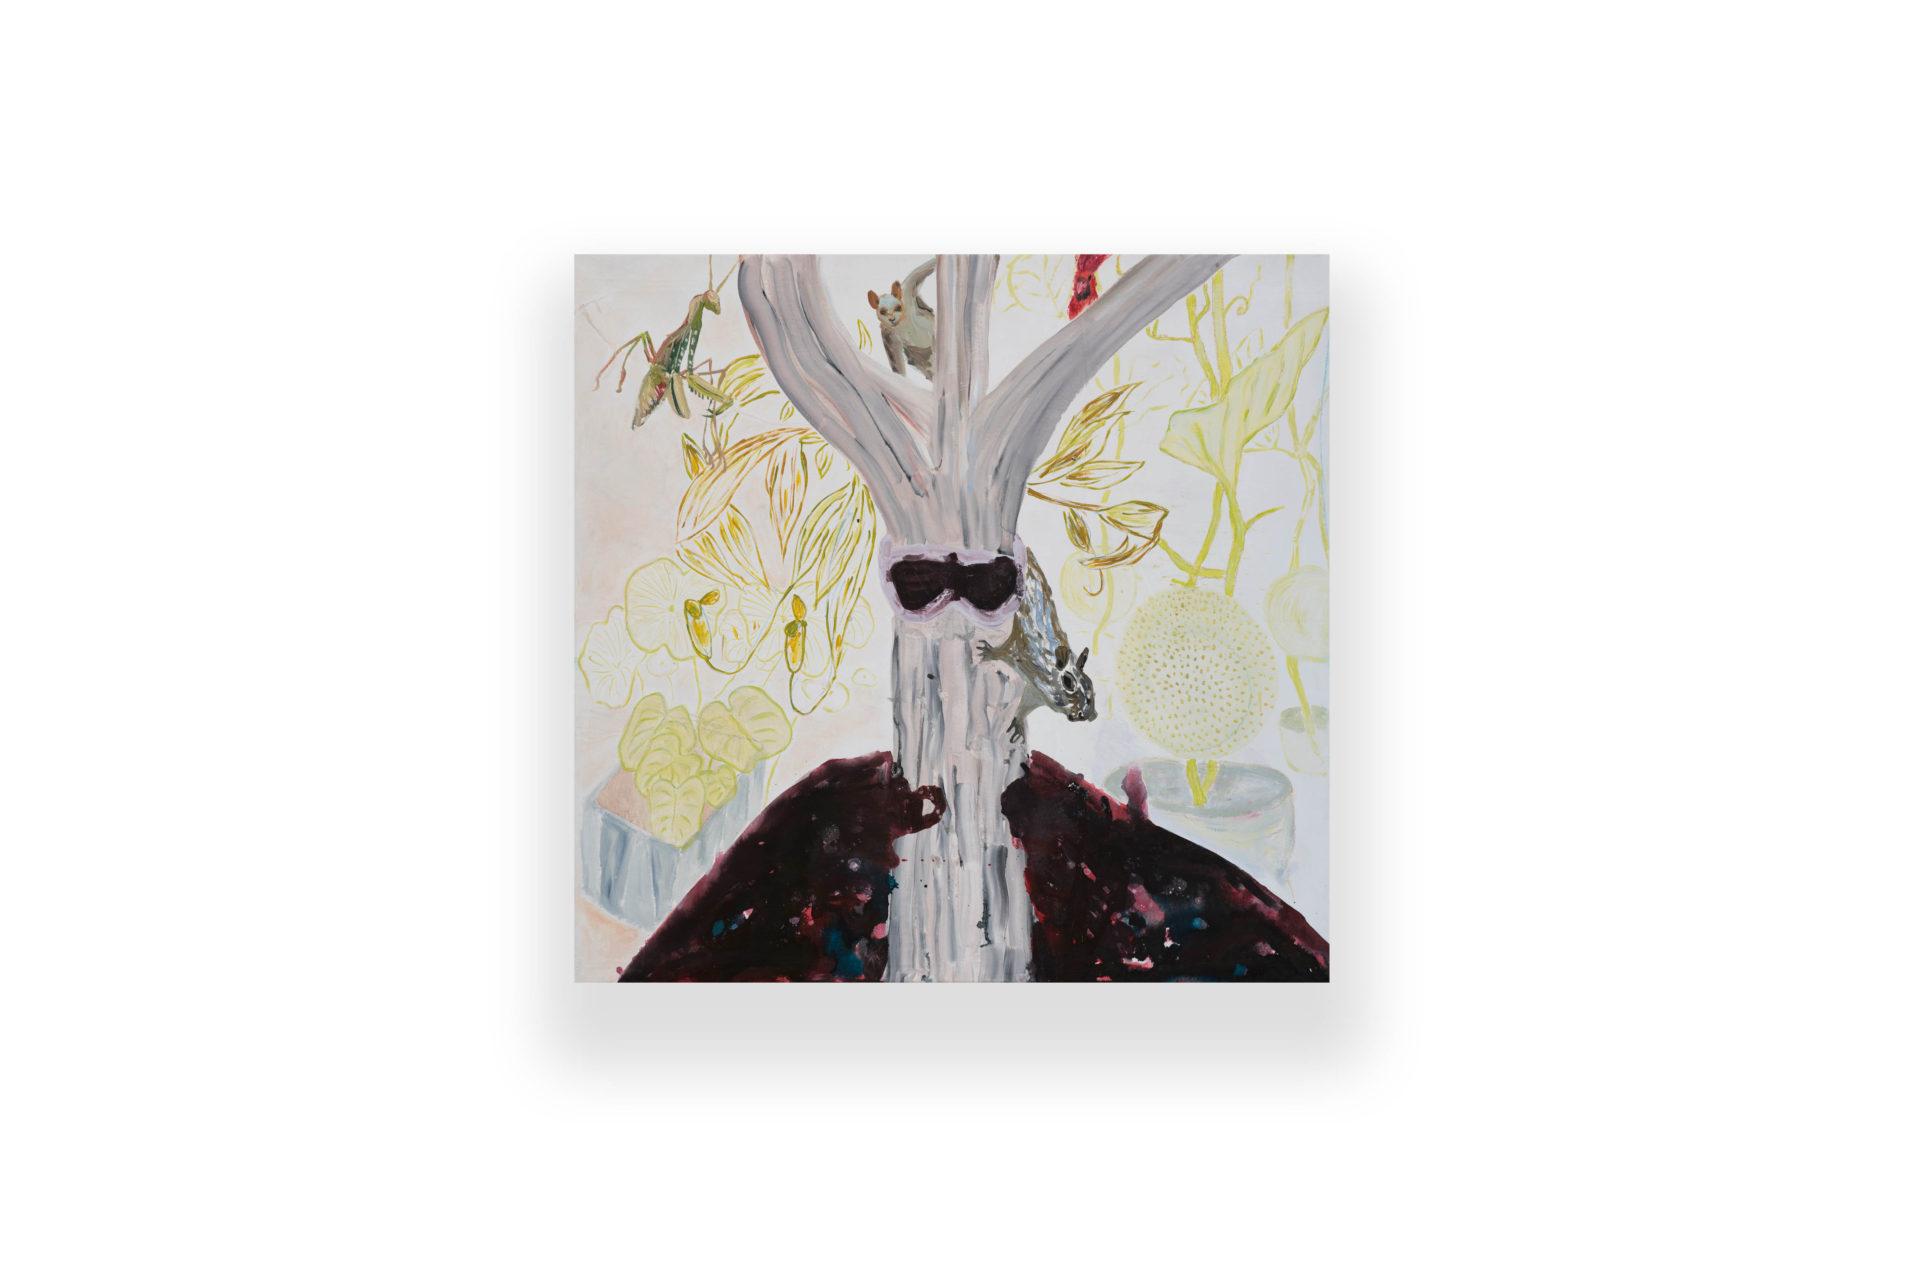 Brooklyn by Night | ink, aquarelle, acrylic and pastel on canvas - tuš, aqvarel, akryl a pastelka na plátne | 130 x 135 | 2017